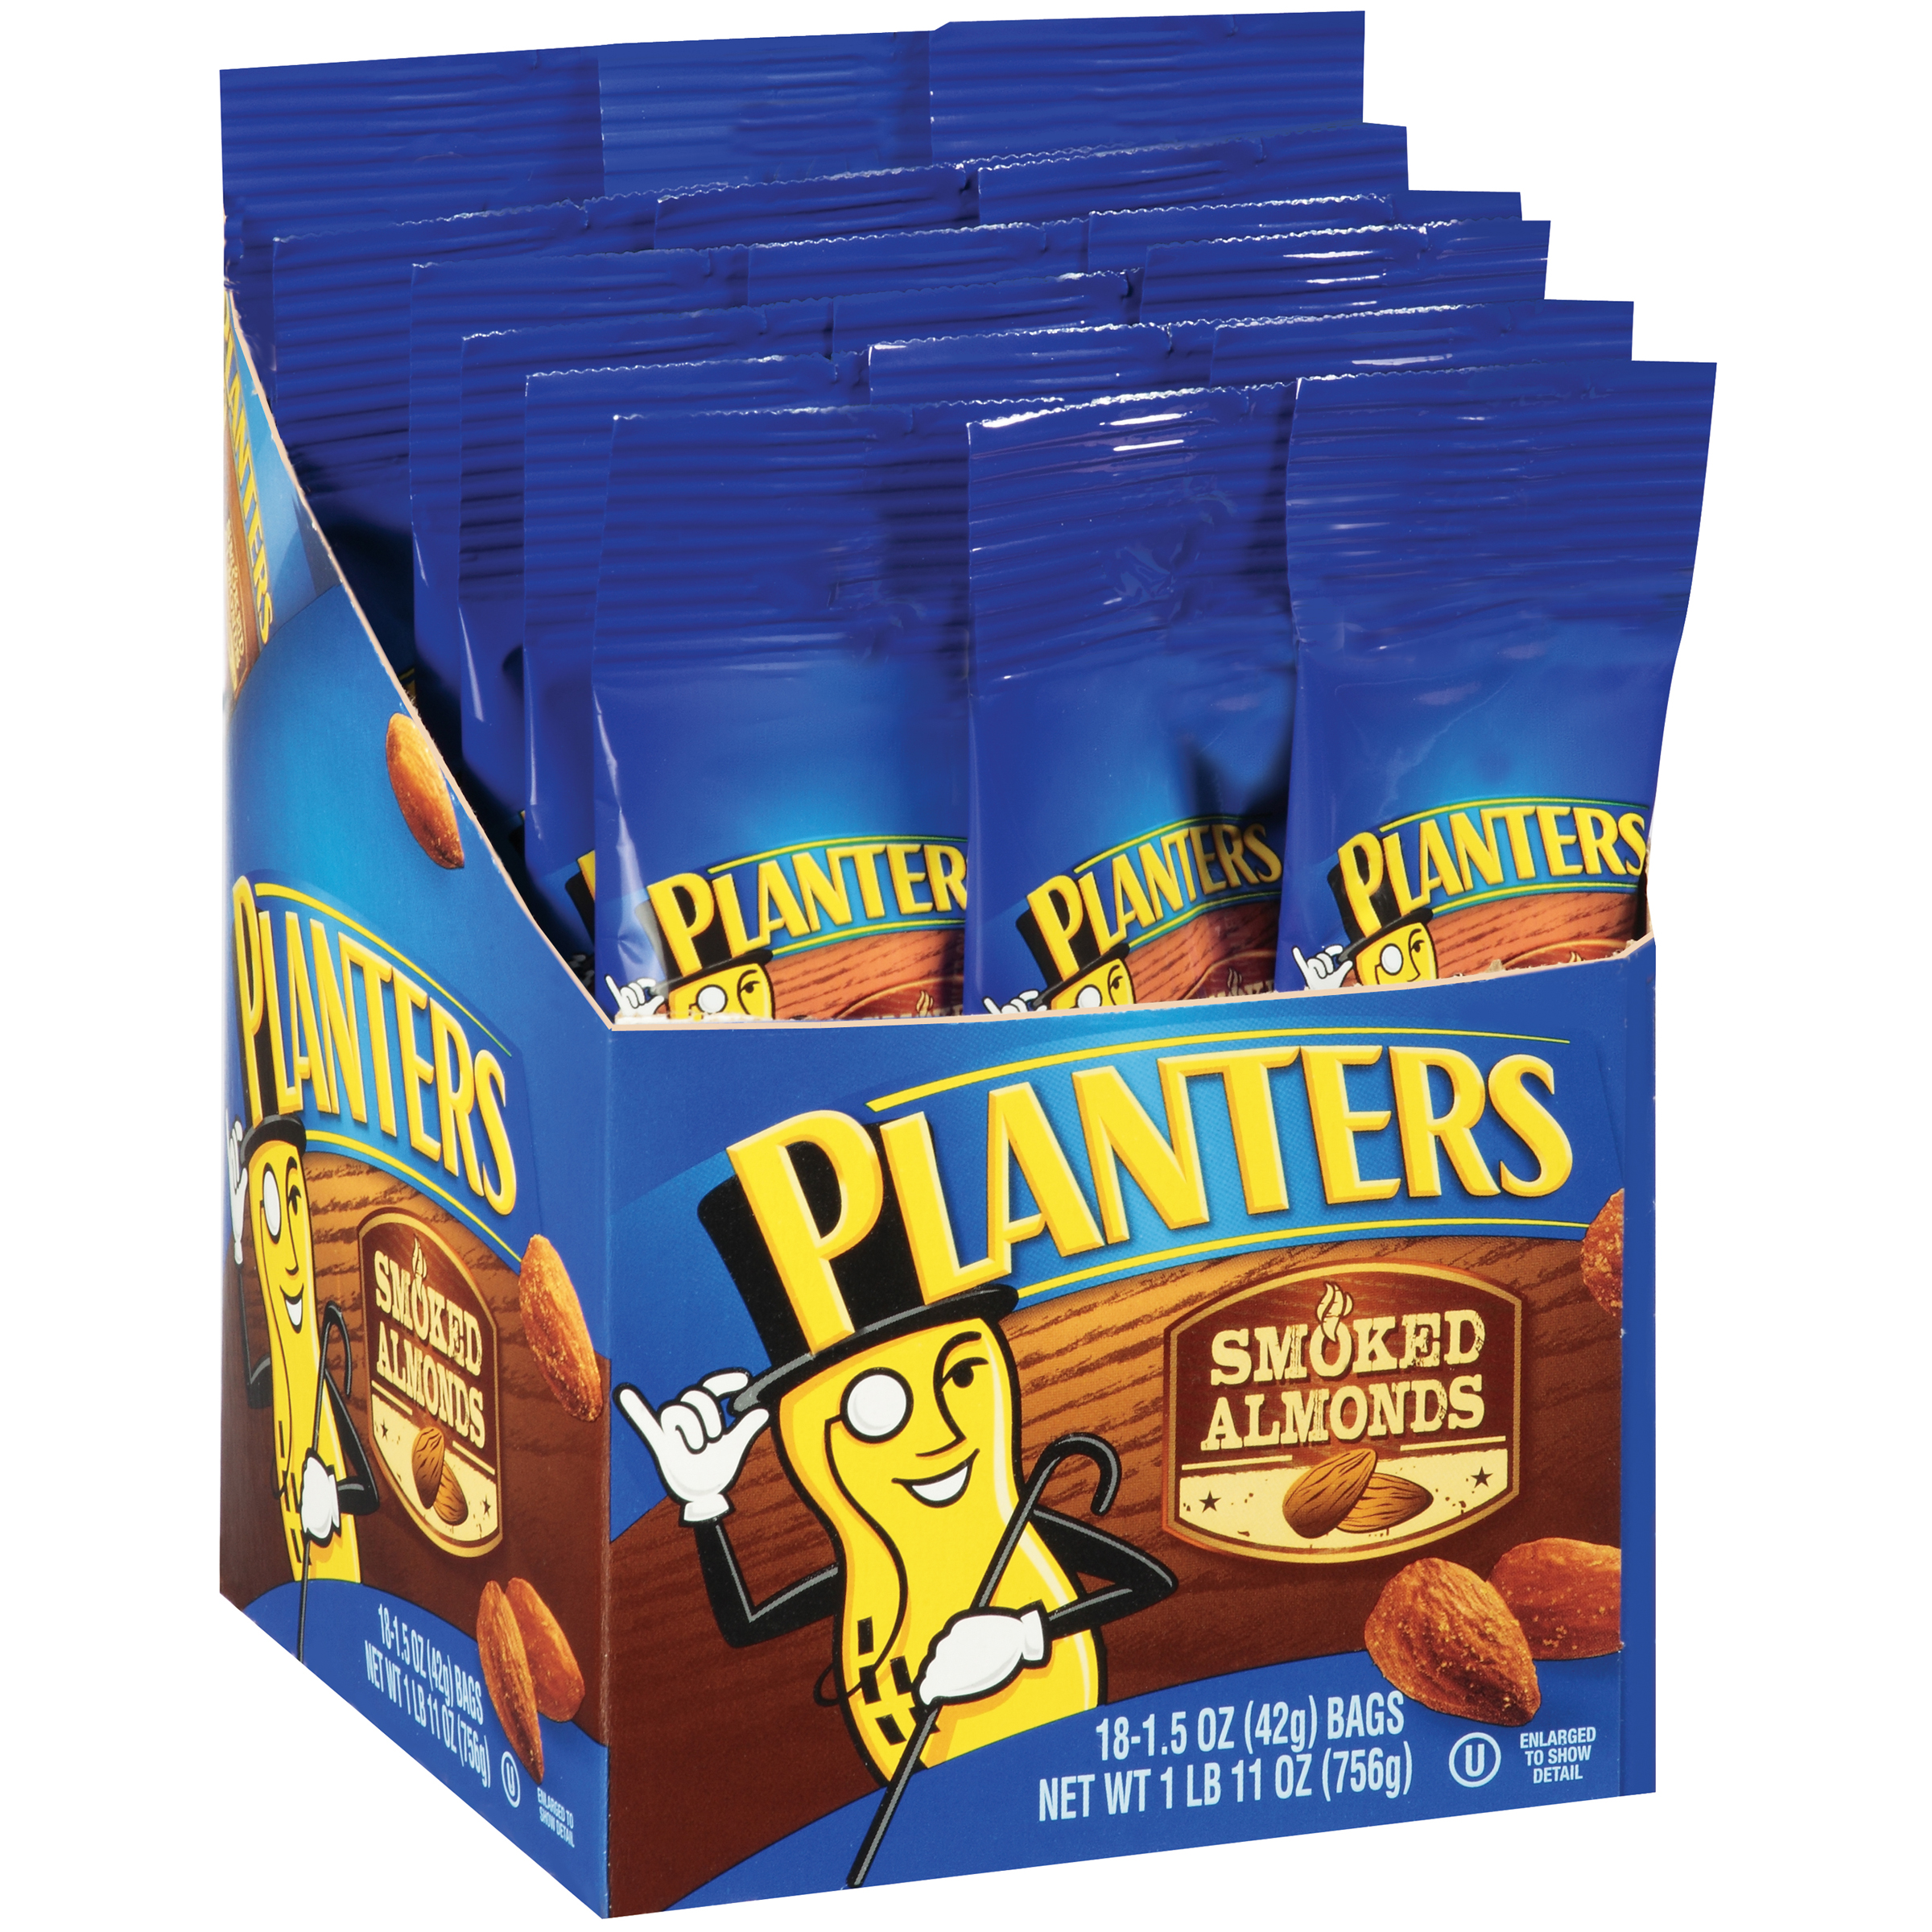 Planters Smoked Almonds 18-1.5 oz. Bags